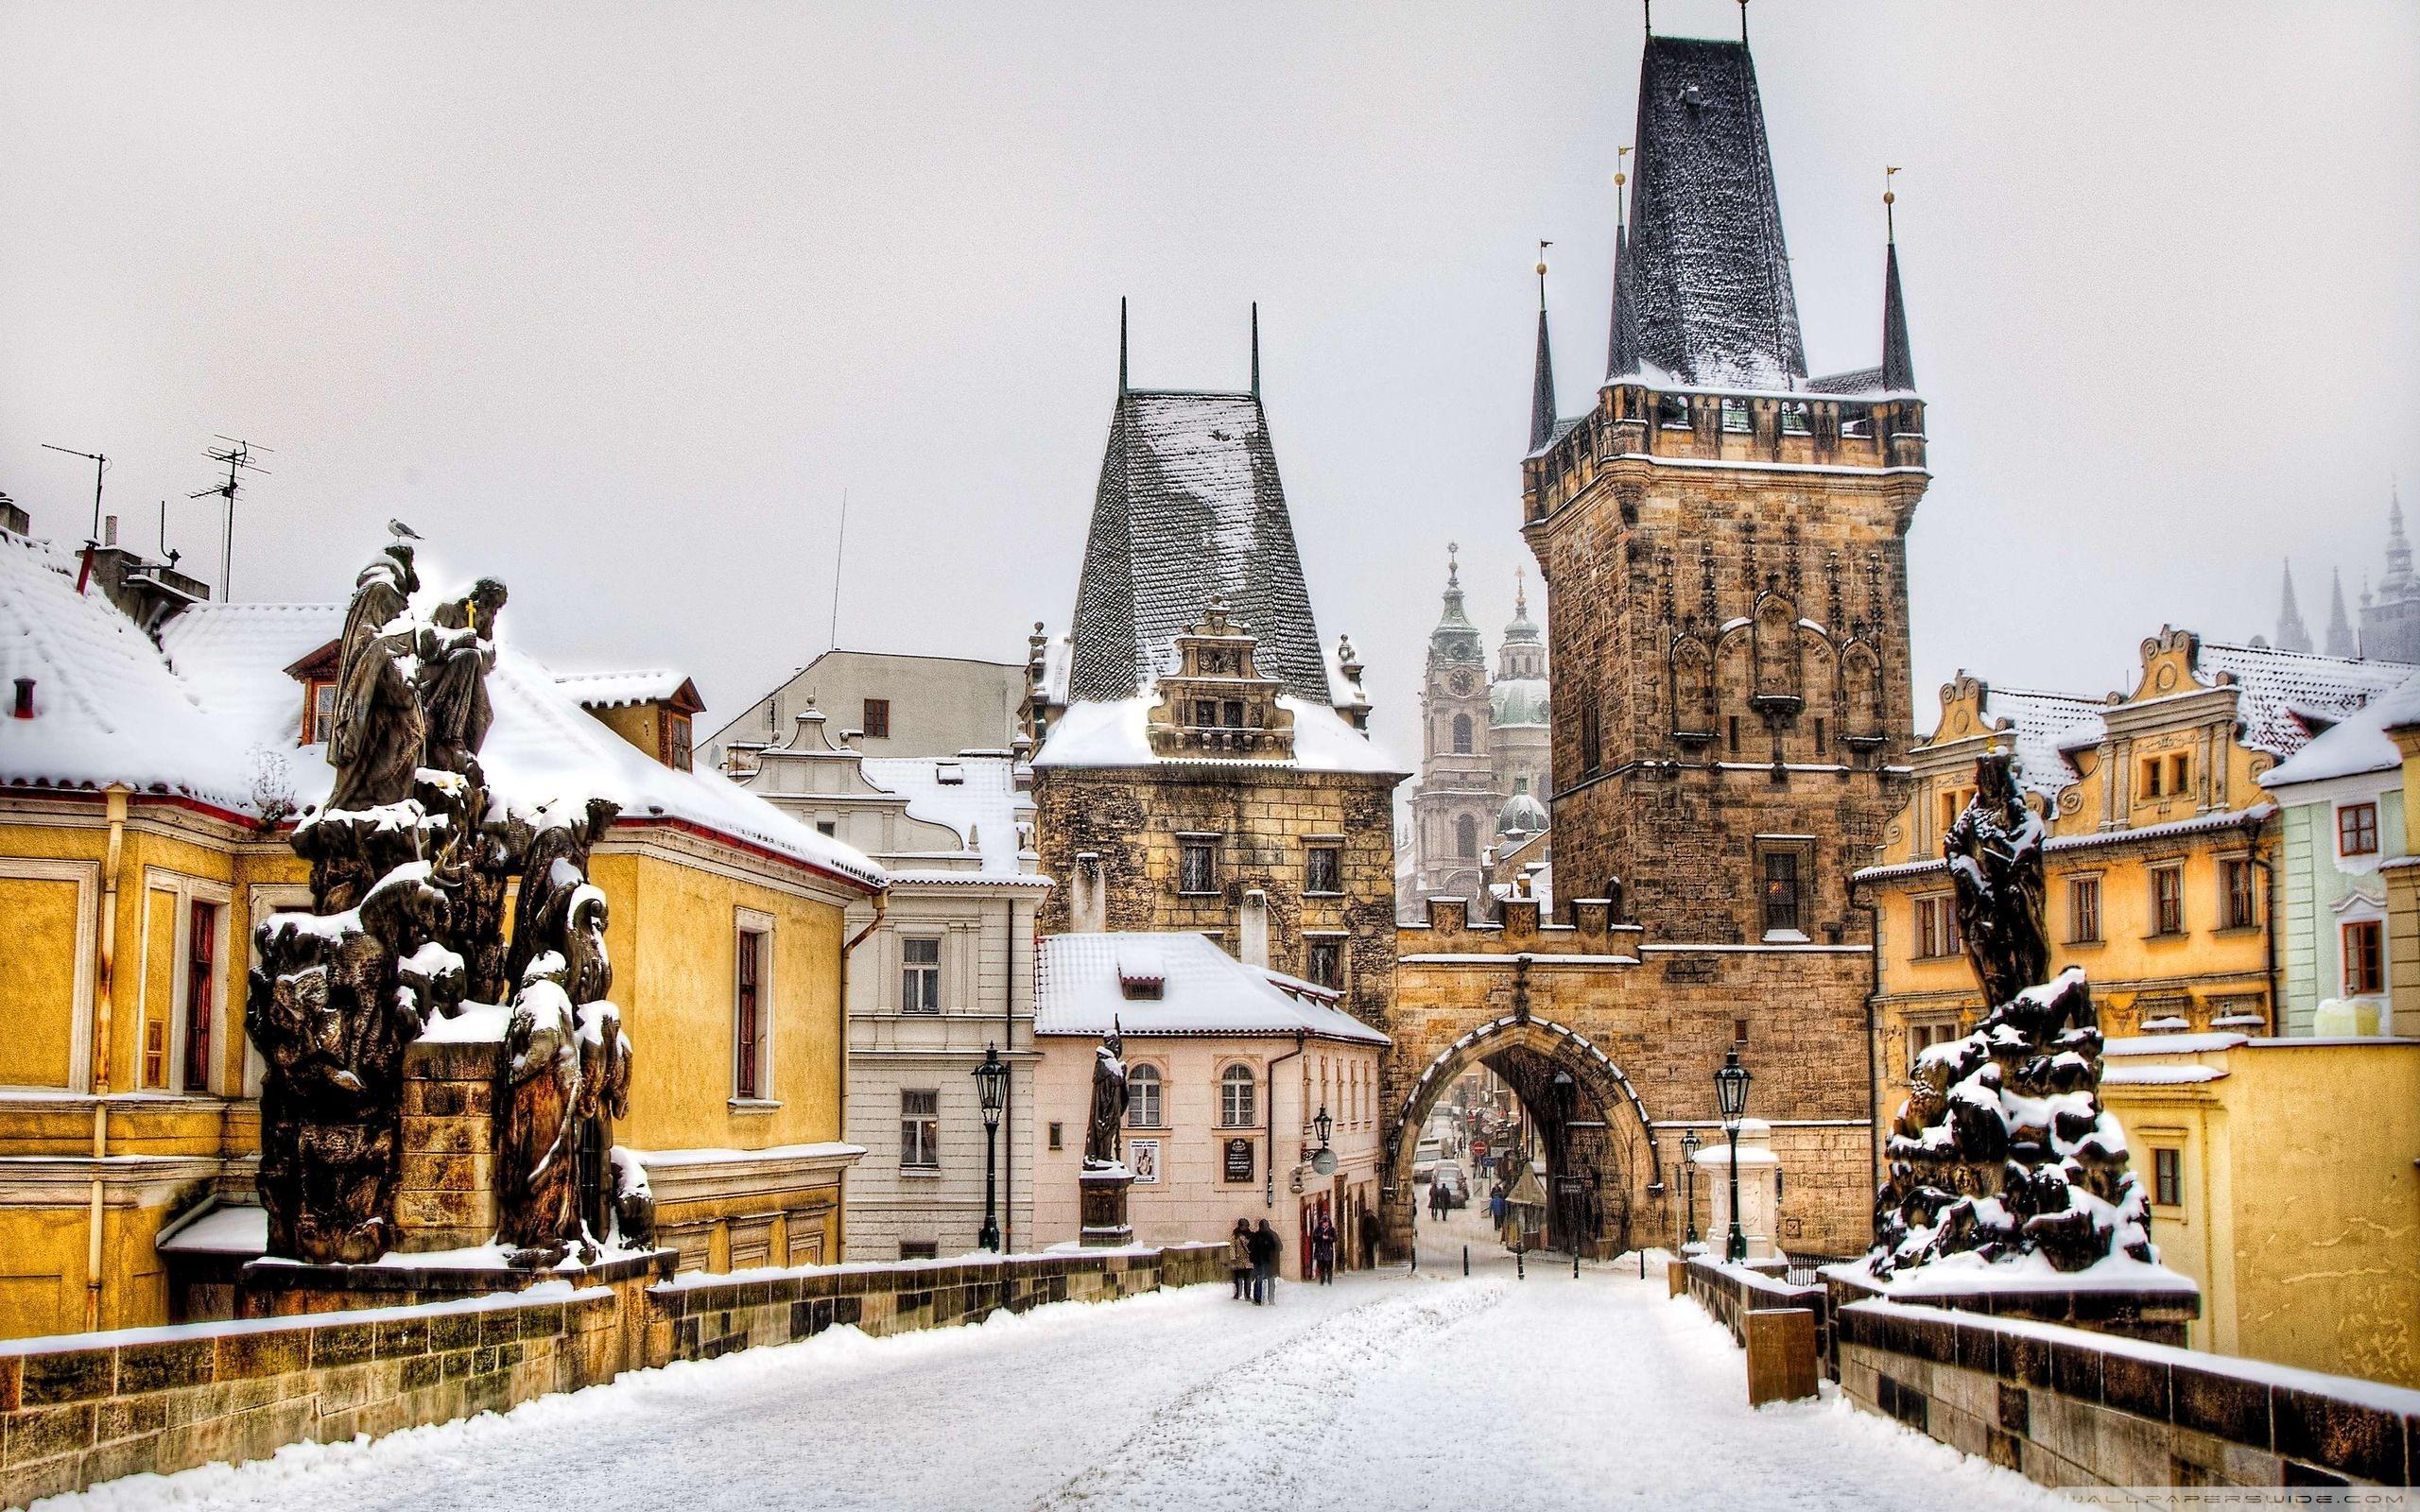 Prague Wallpaper 14   2560 X 1600 stmednet 2560x1600